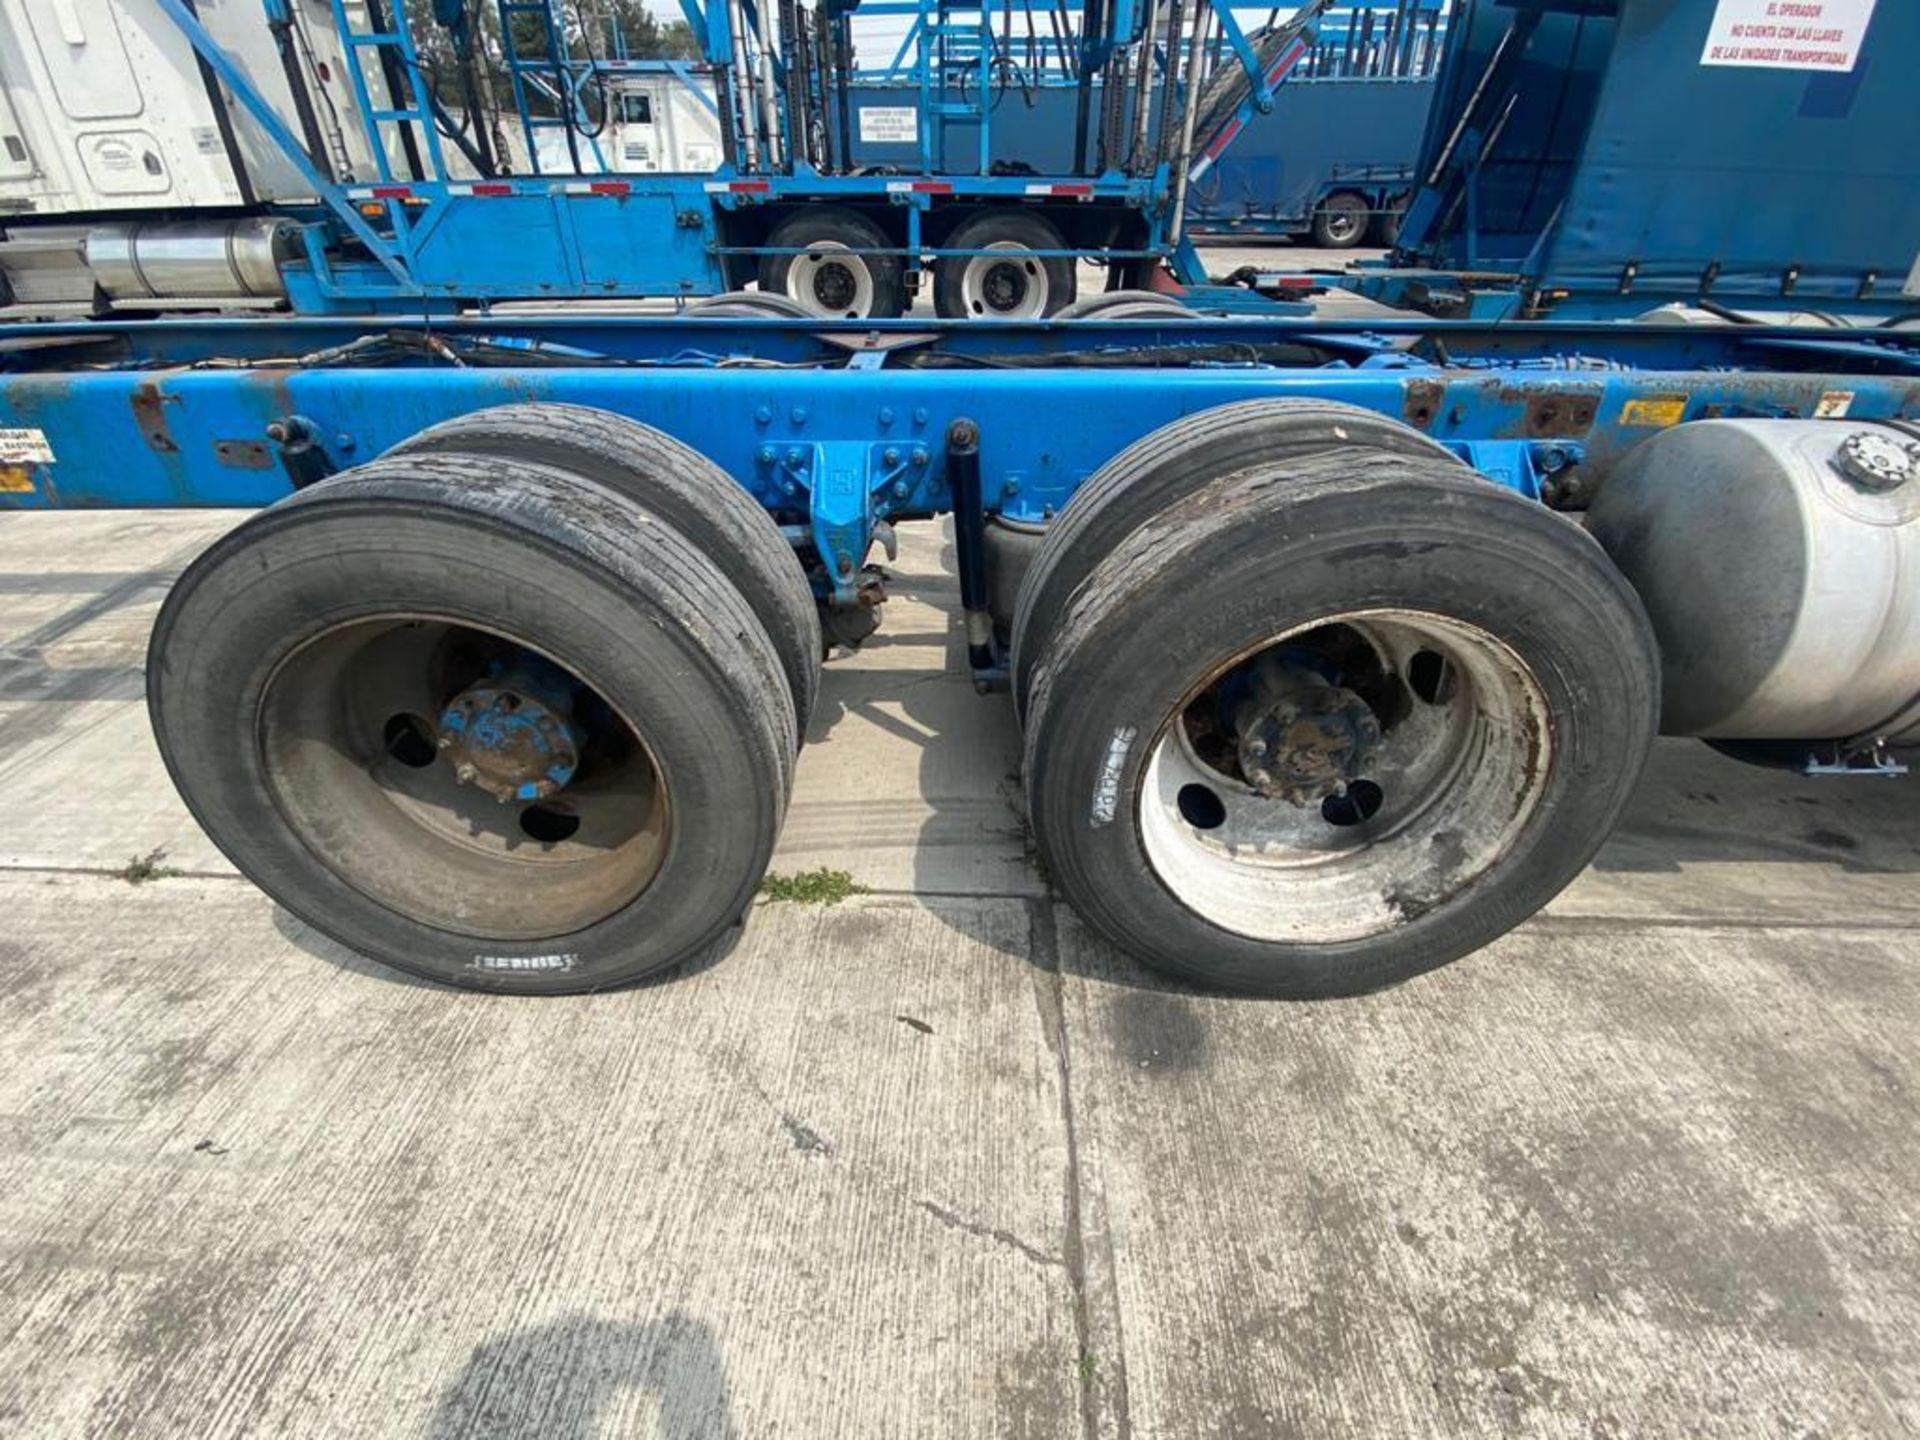 1999 Kenworth Sleeper truck tractor, standard transmission of 18 speeds - Image 17 of 62